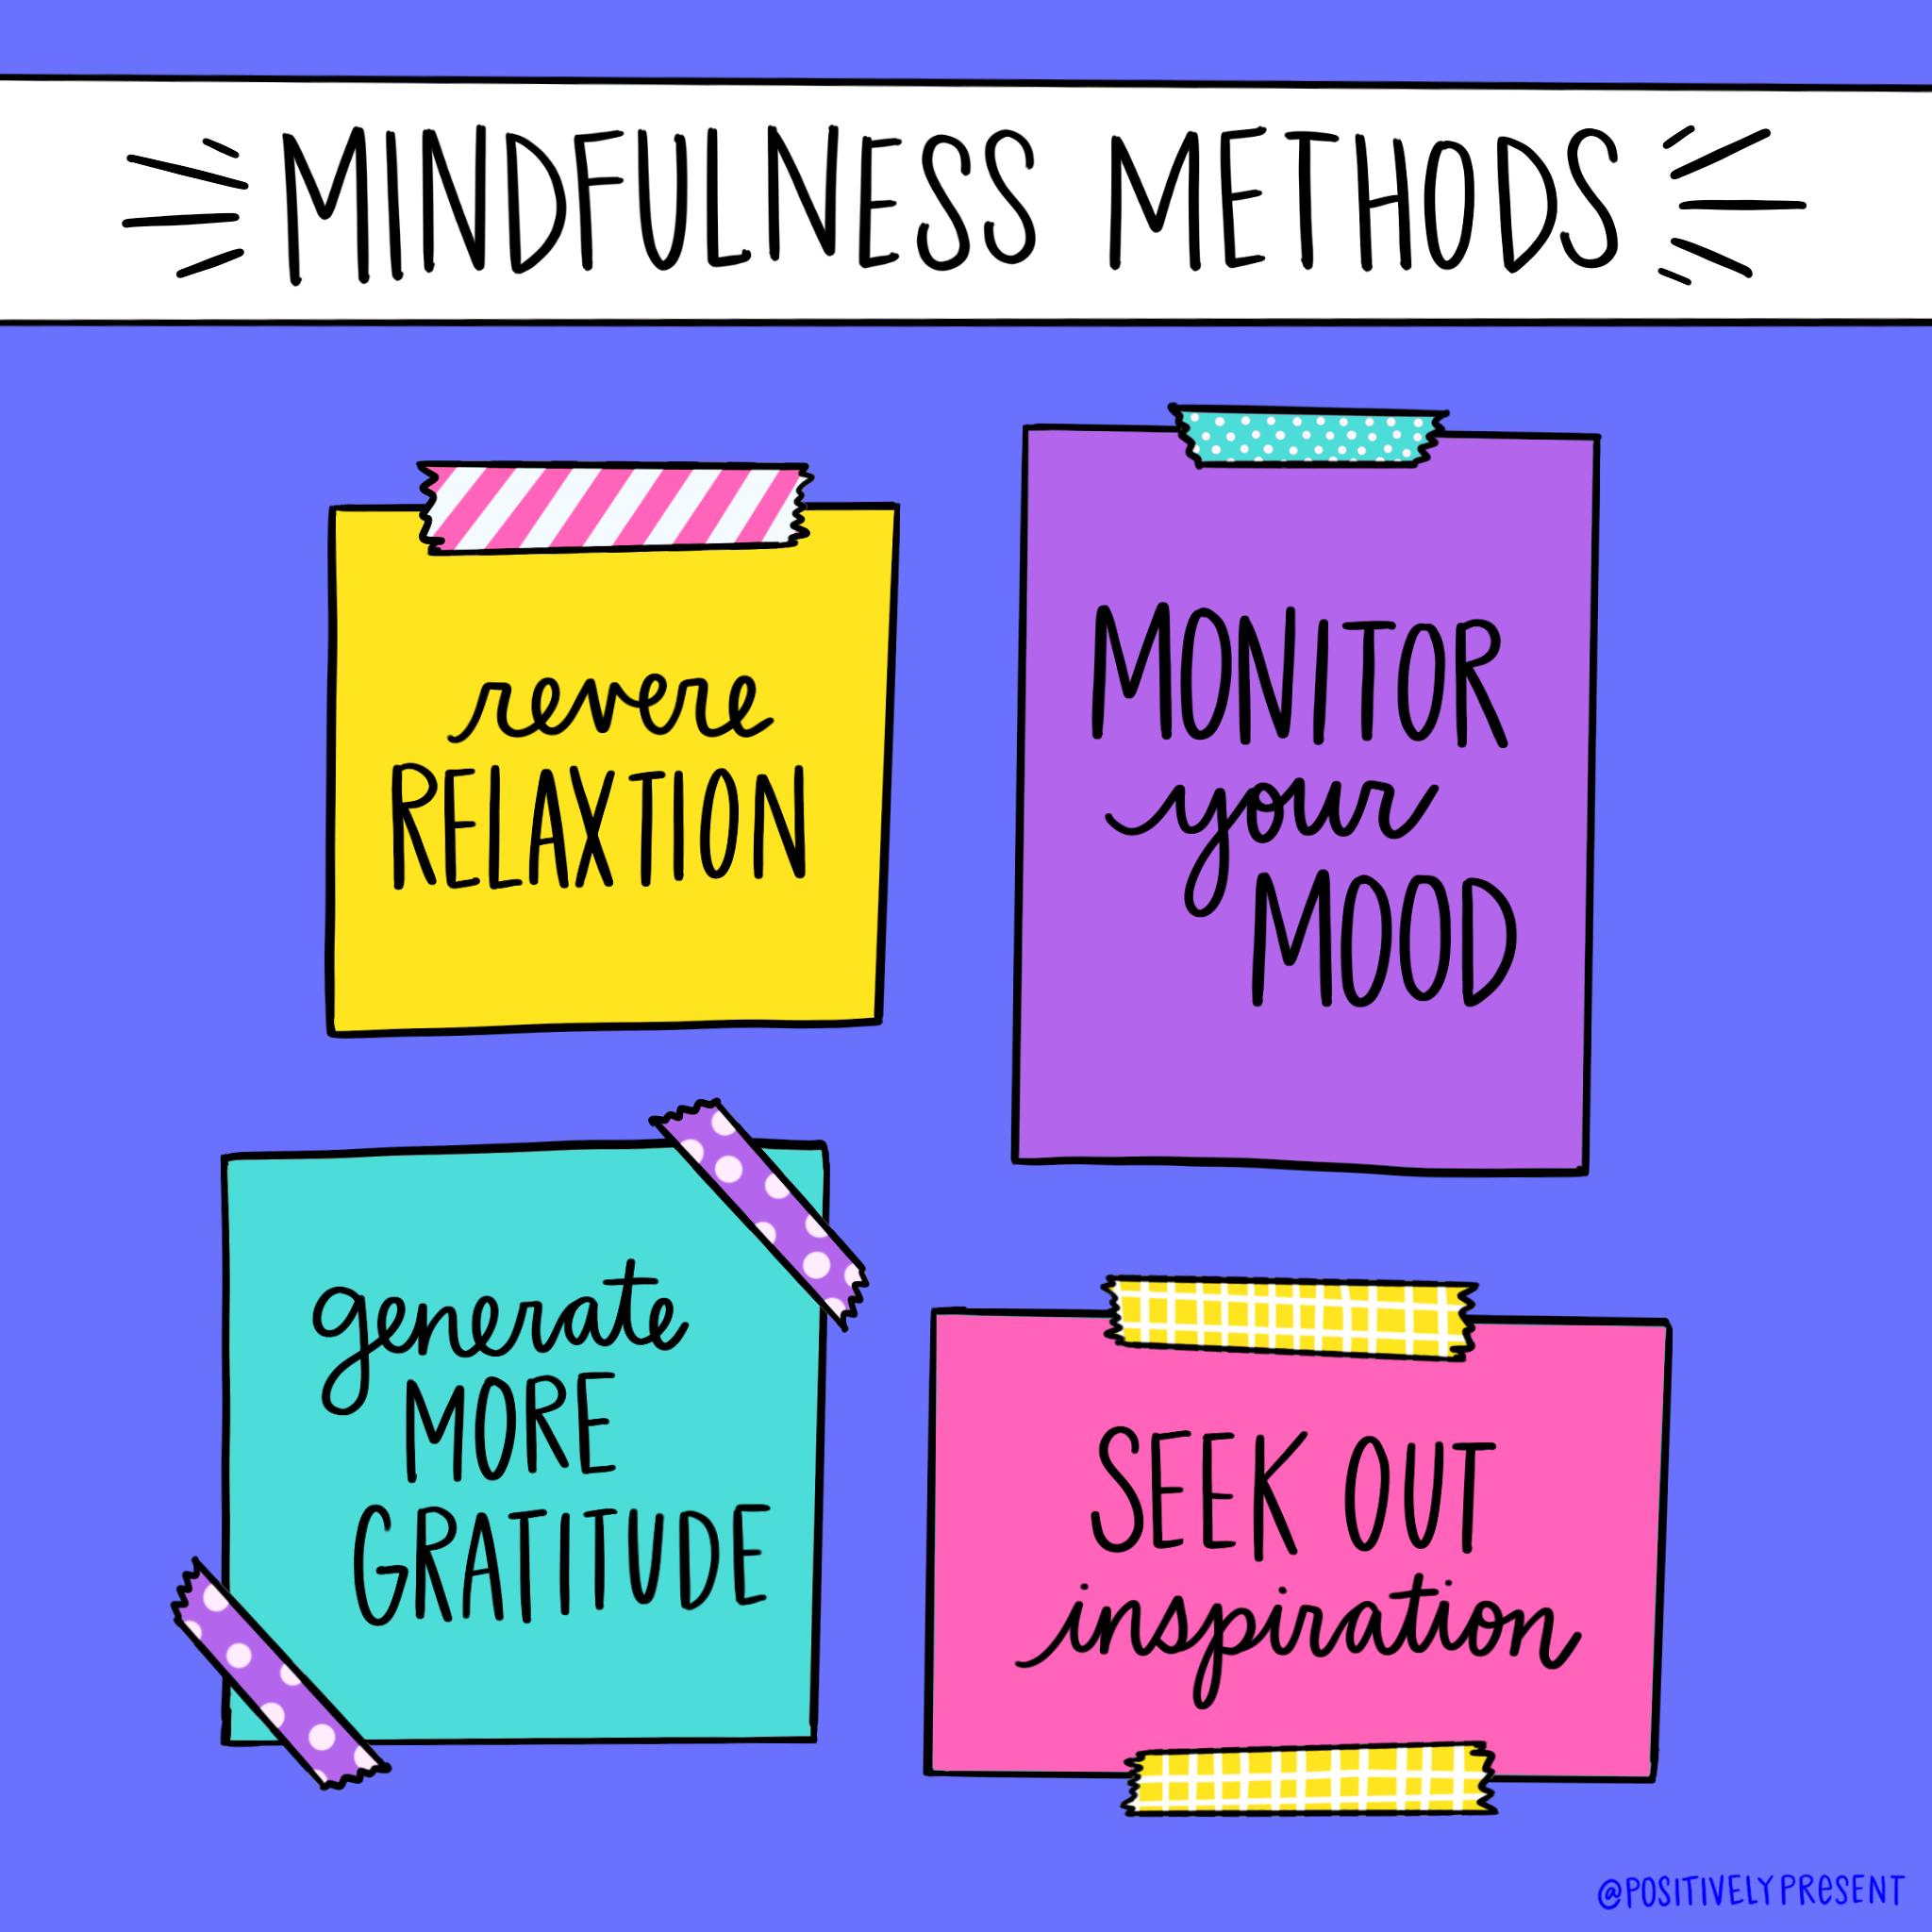 mindfulness methods